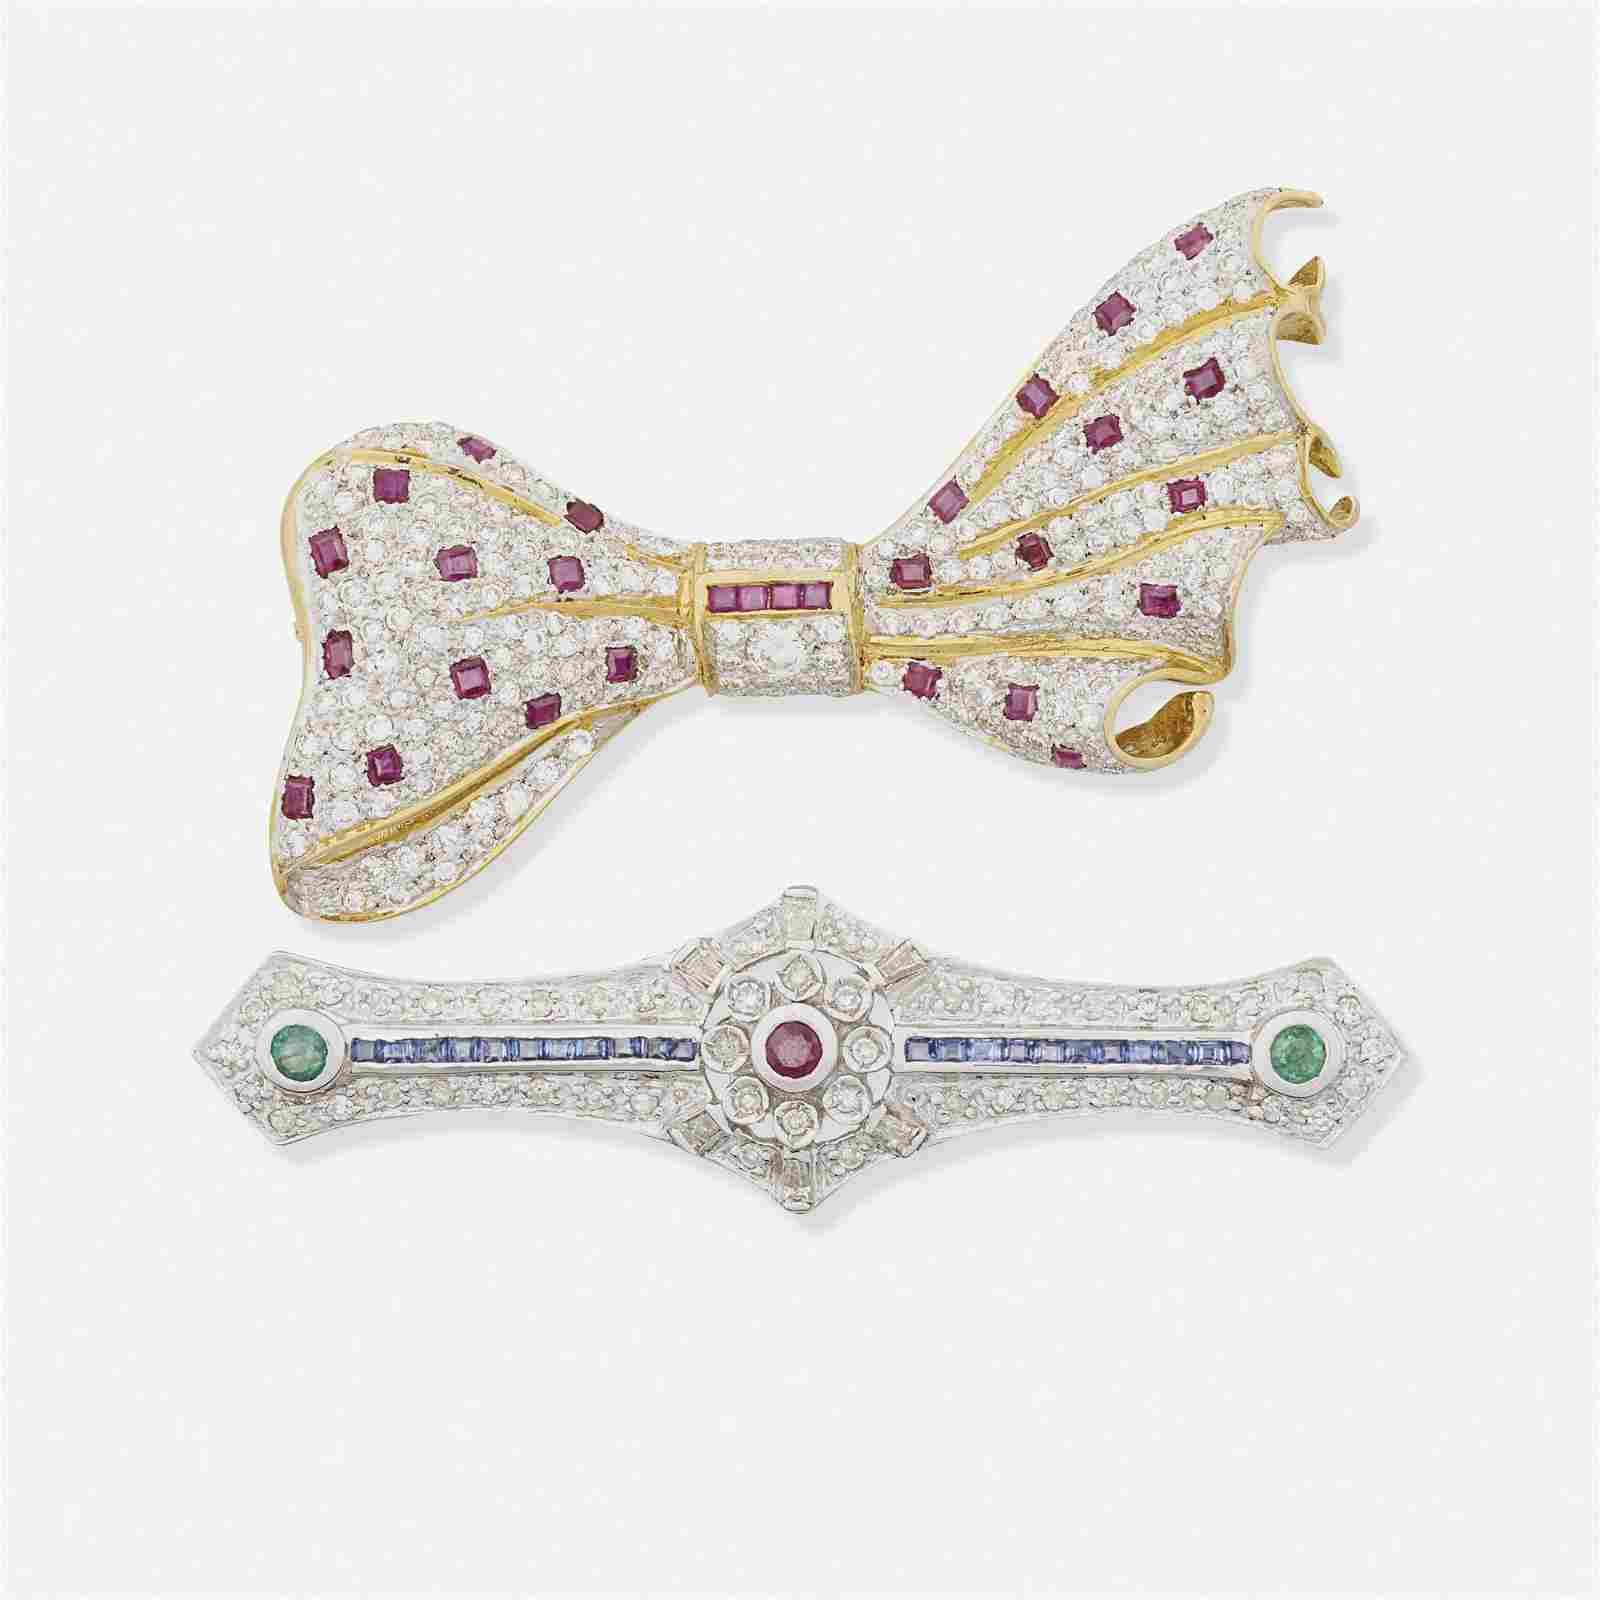 Diamond and gem-set brooches